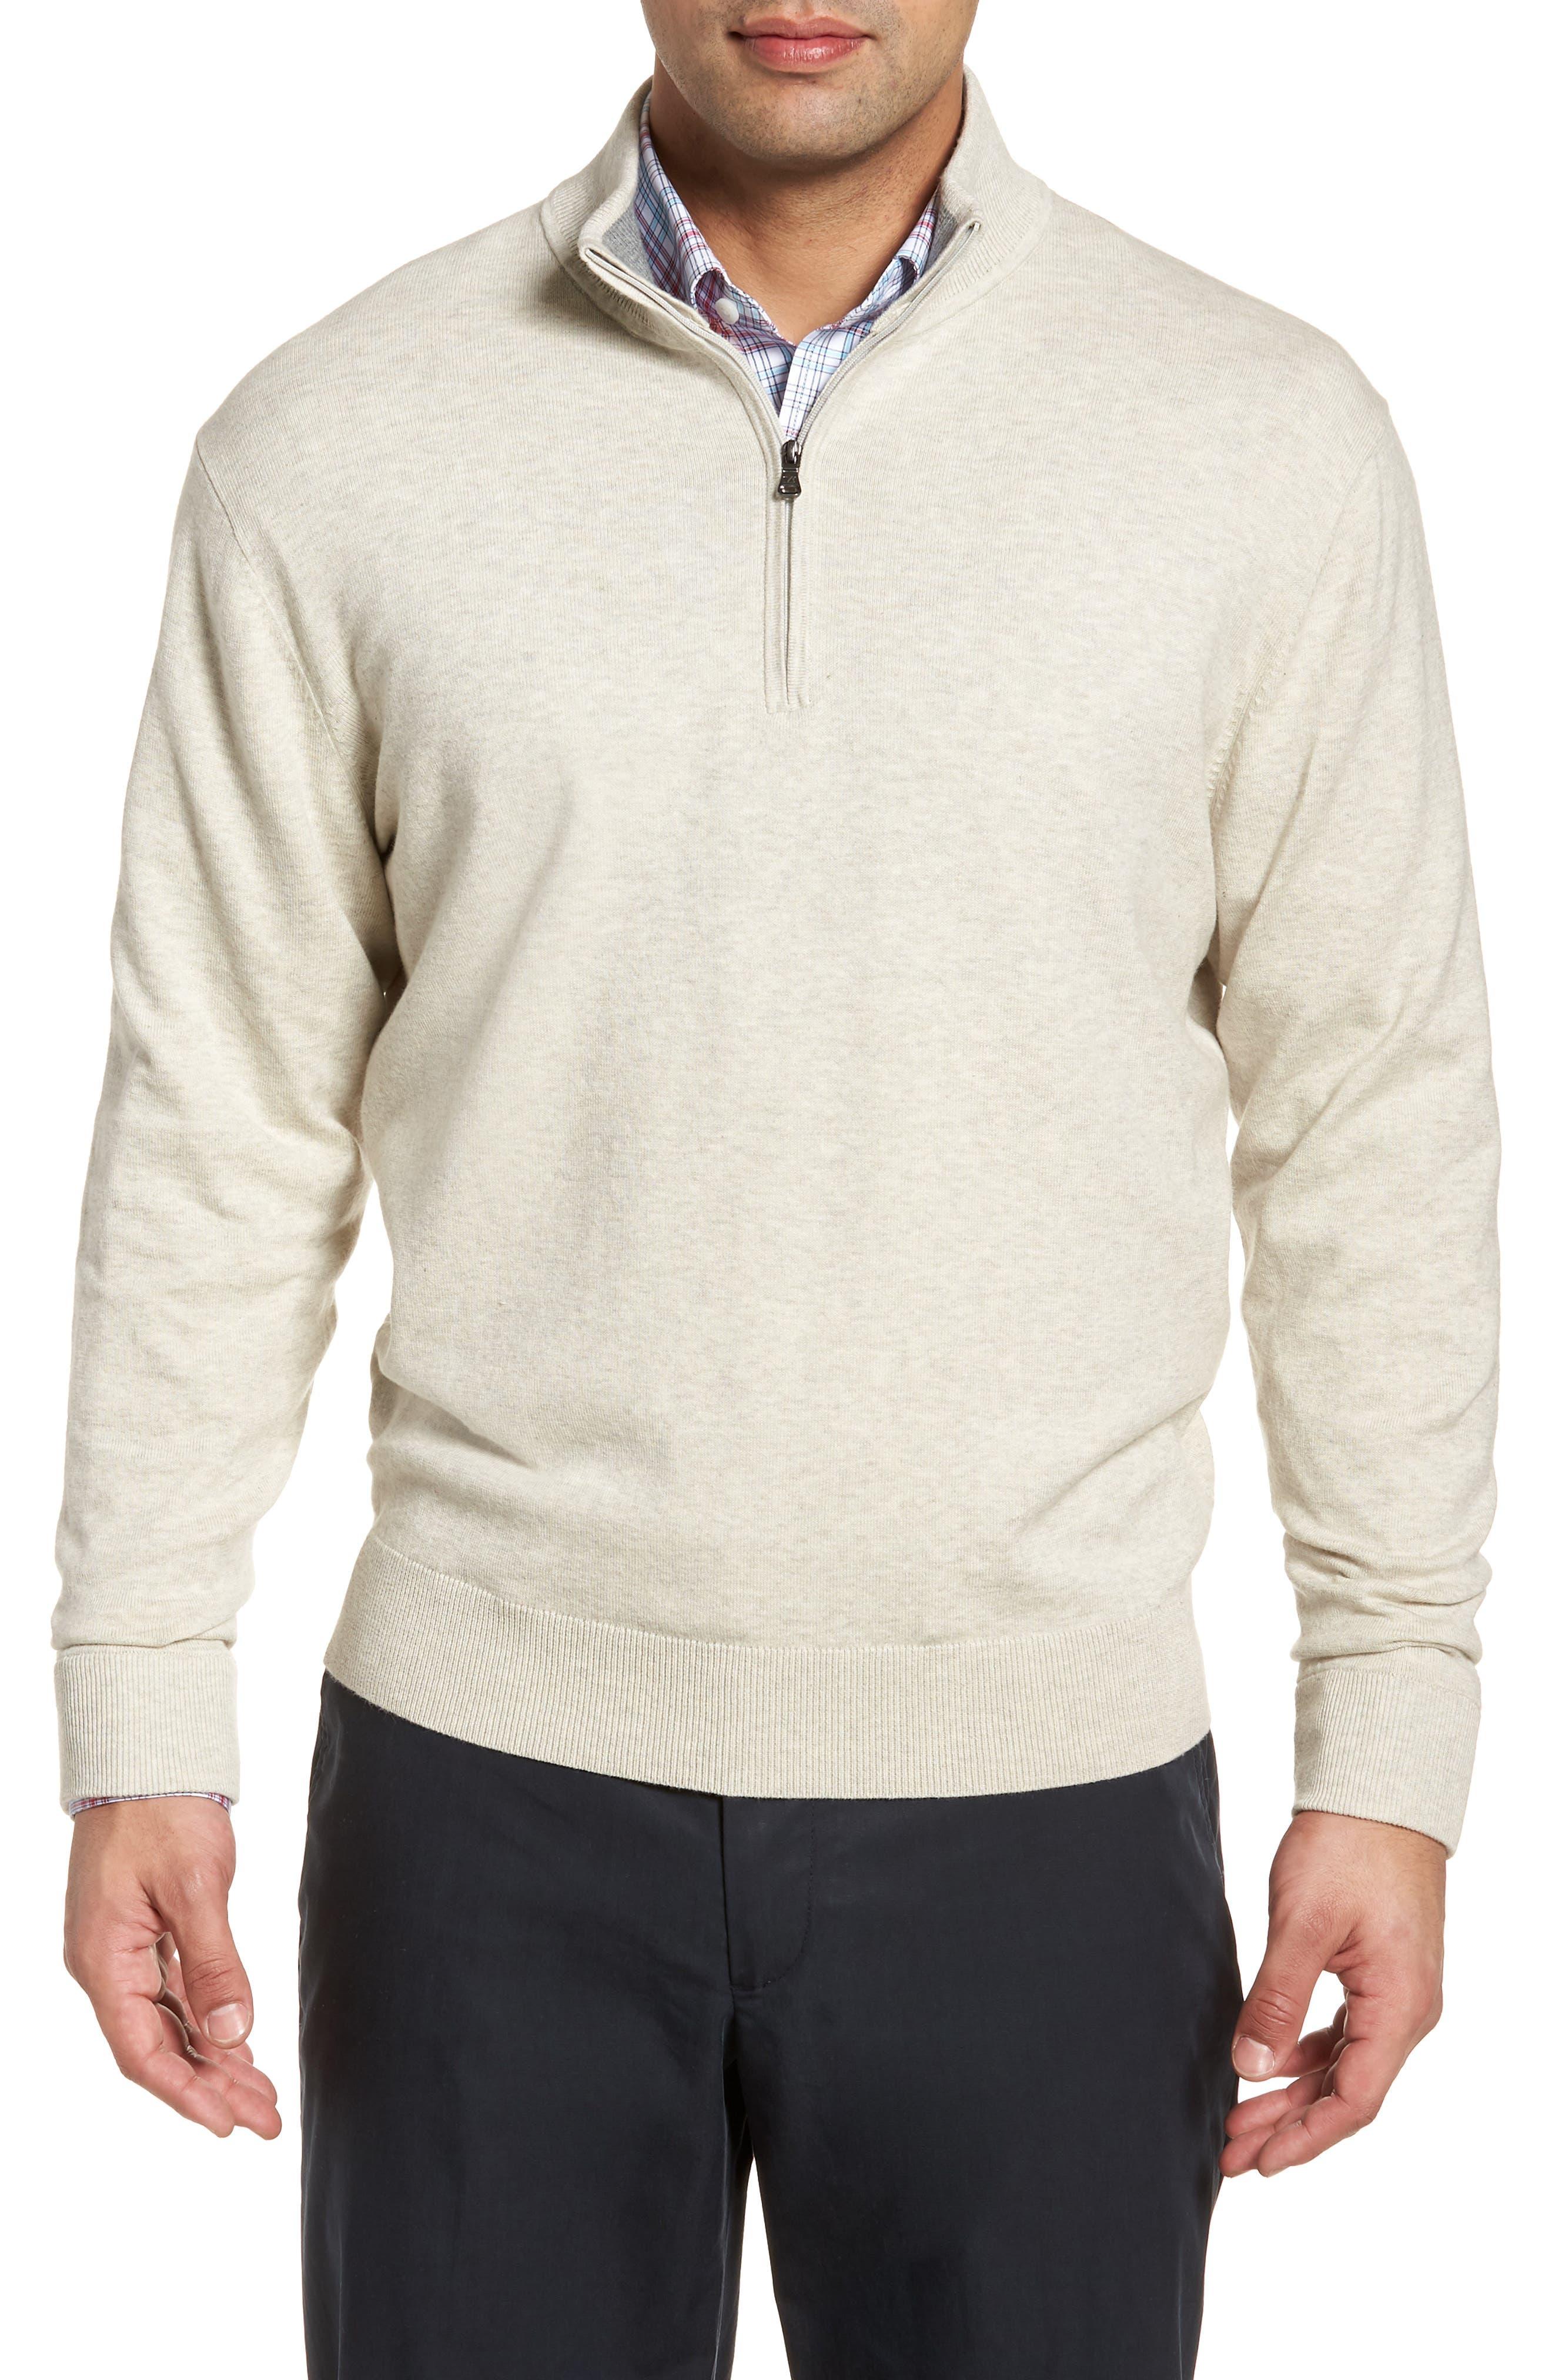 Cutter & Buck Lakemont Classic Fit Quarter Zip Sweater, Grey